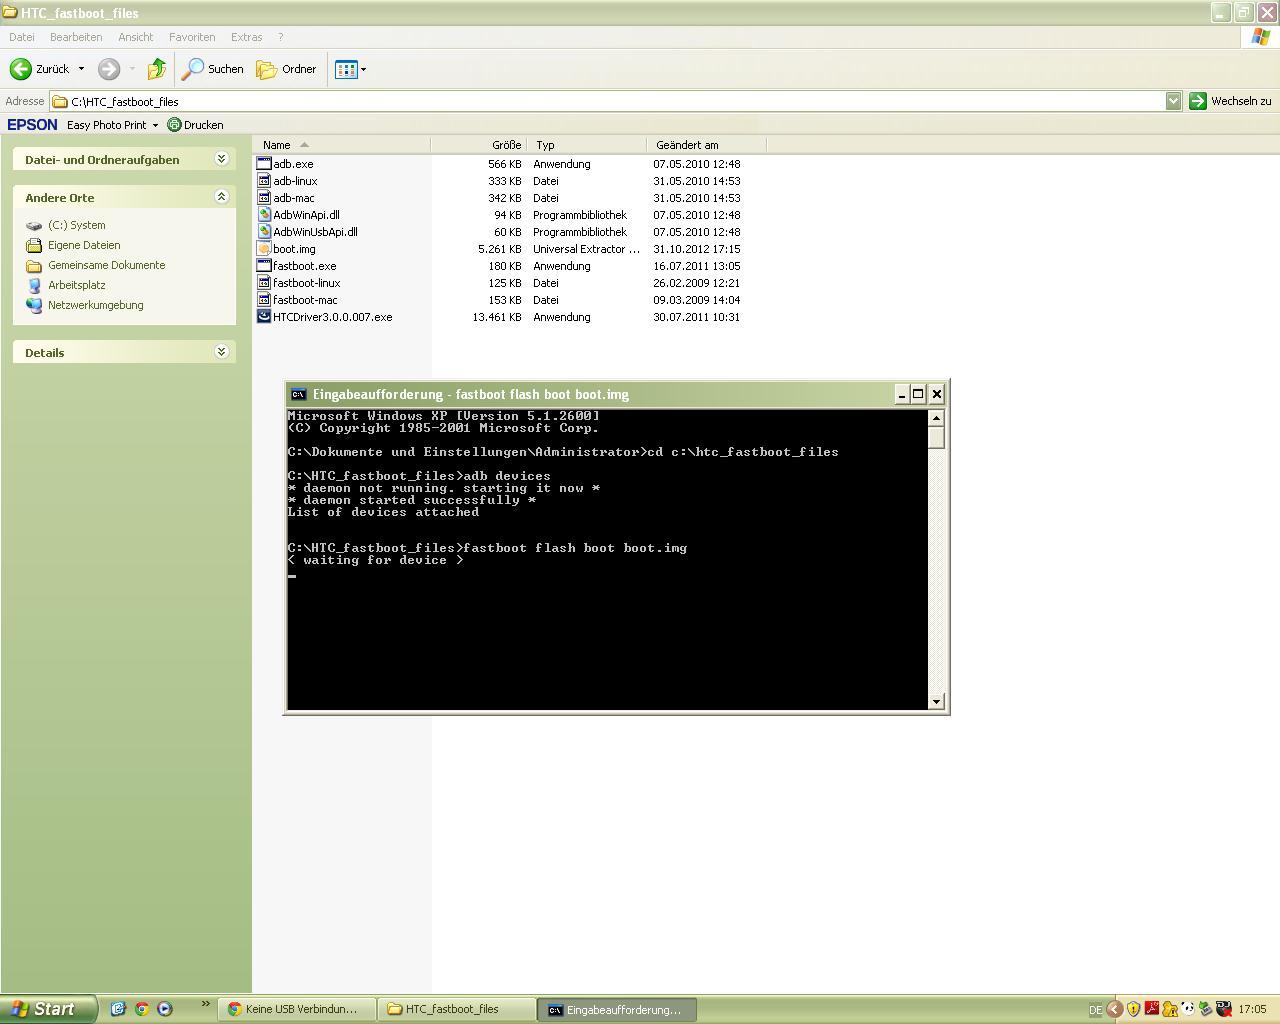 Qualcomm Atheros Ar5bwb222 Driver Windows 10 - softgetapisoft